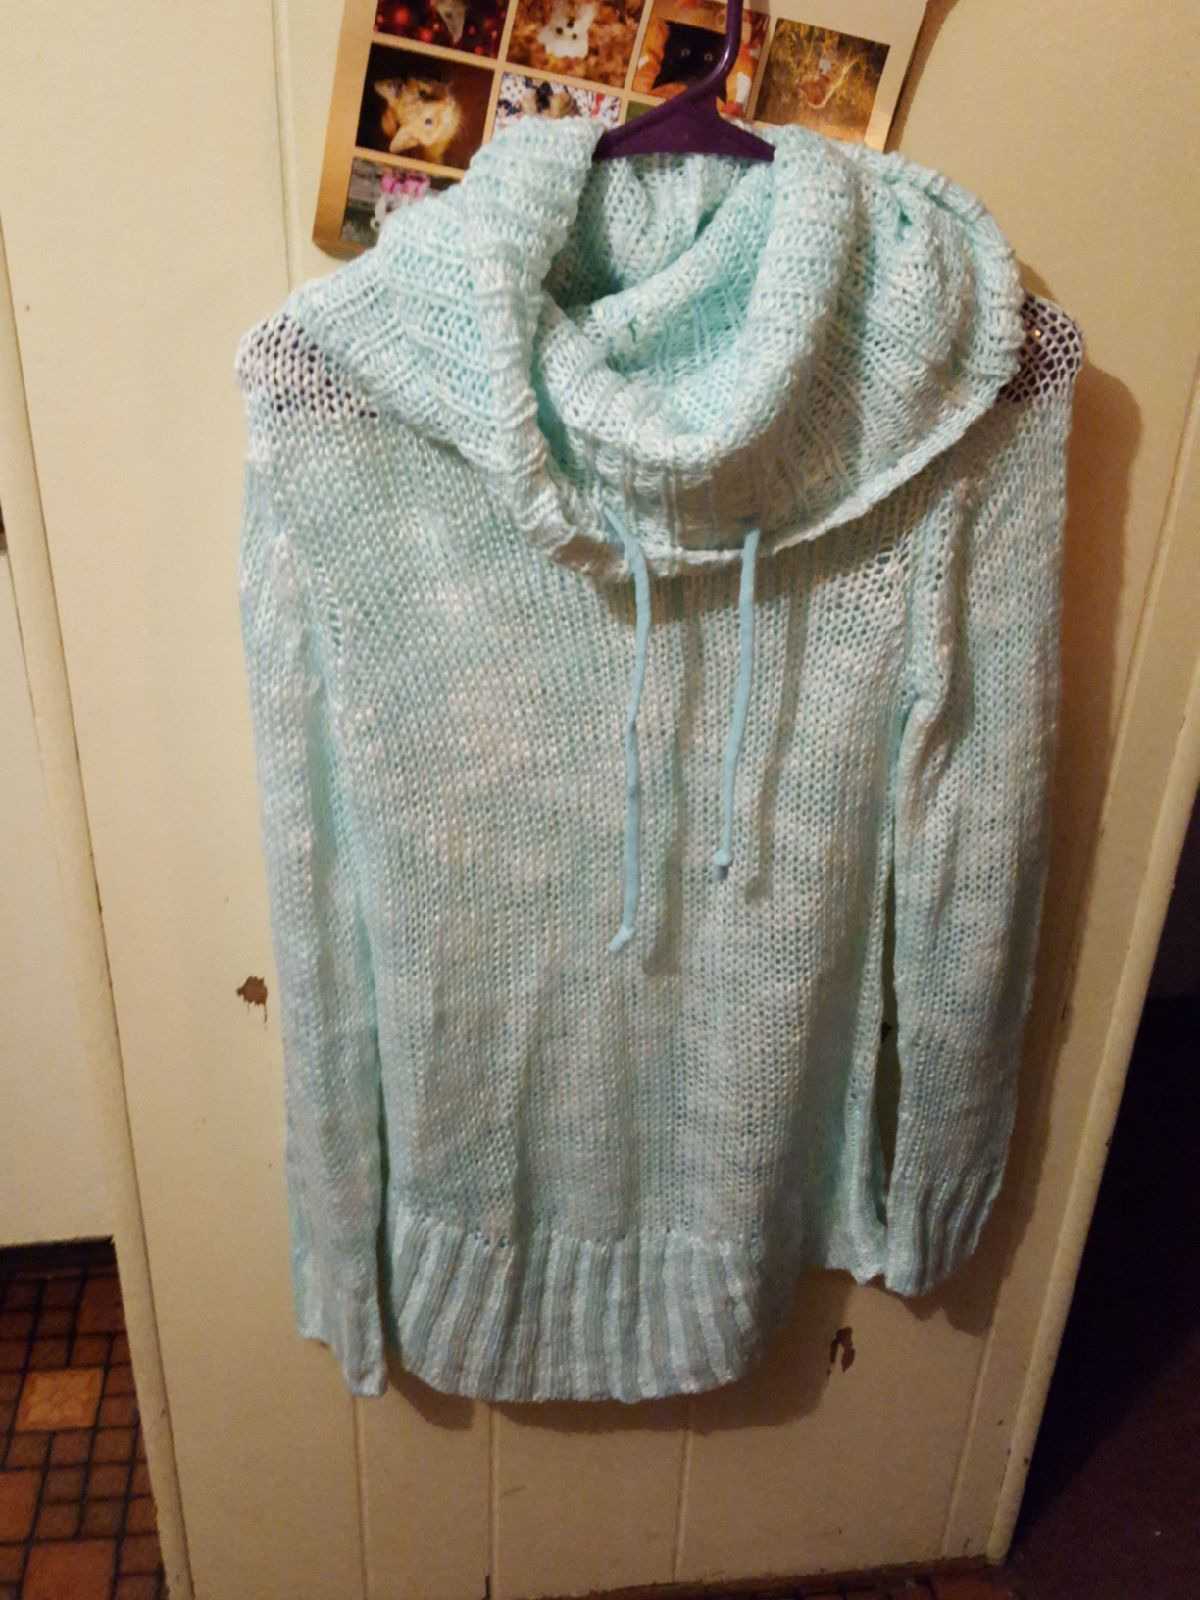 Cute cowl neck sweater - Mercari: BUY & SELL THINGS YOU LOVE